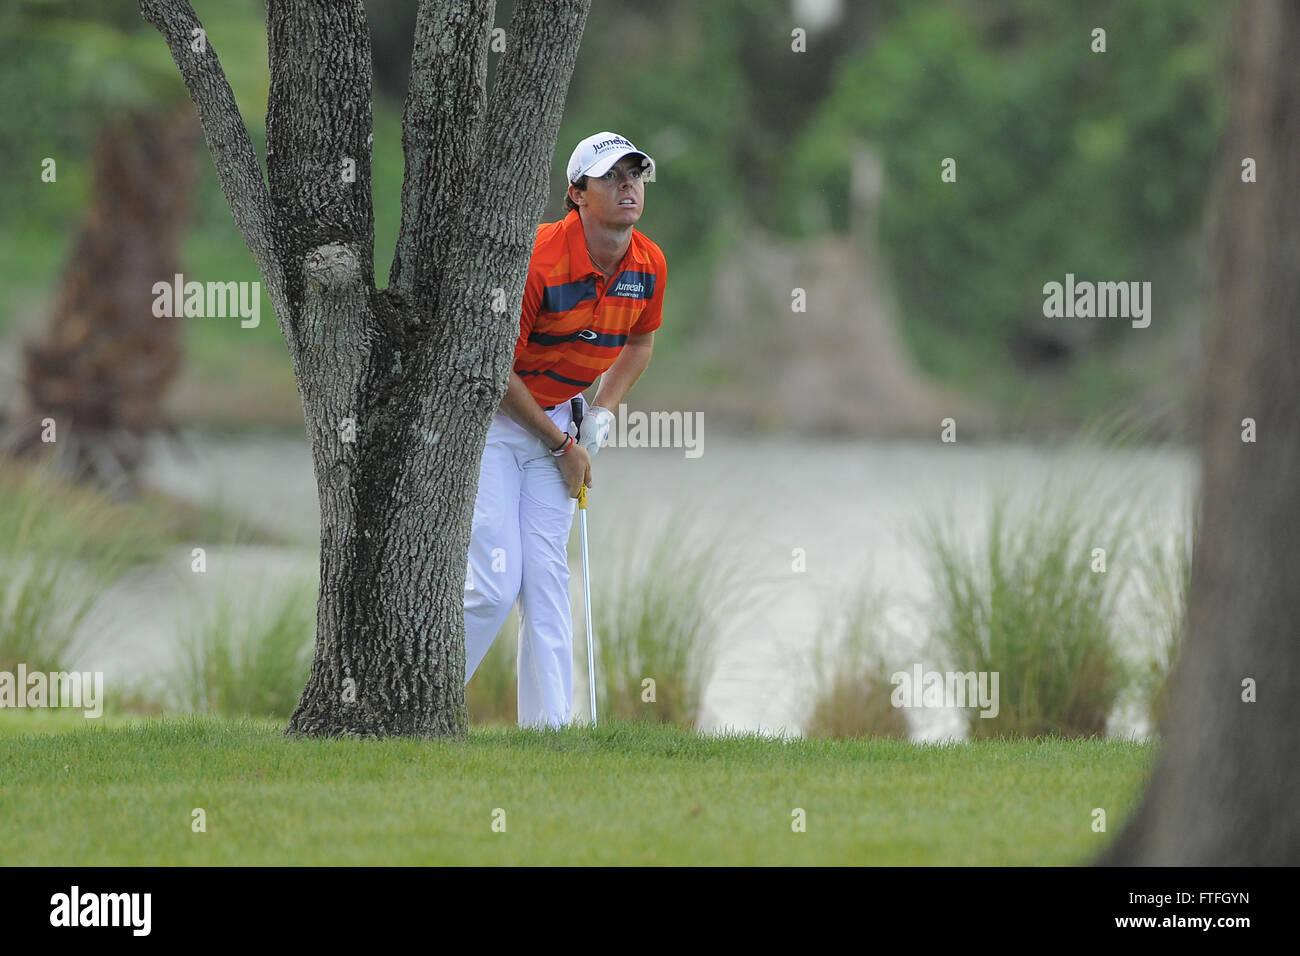 March 3, 2012 - Palm Beach Gardens, Fla, USA - Rory McIlroy hits ...